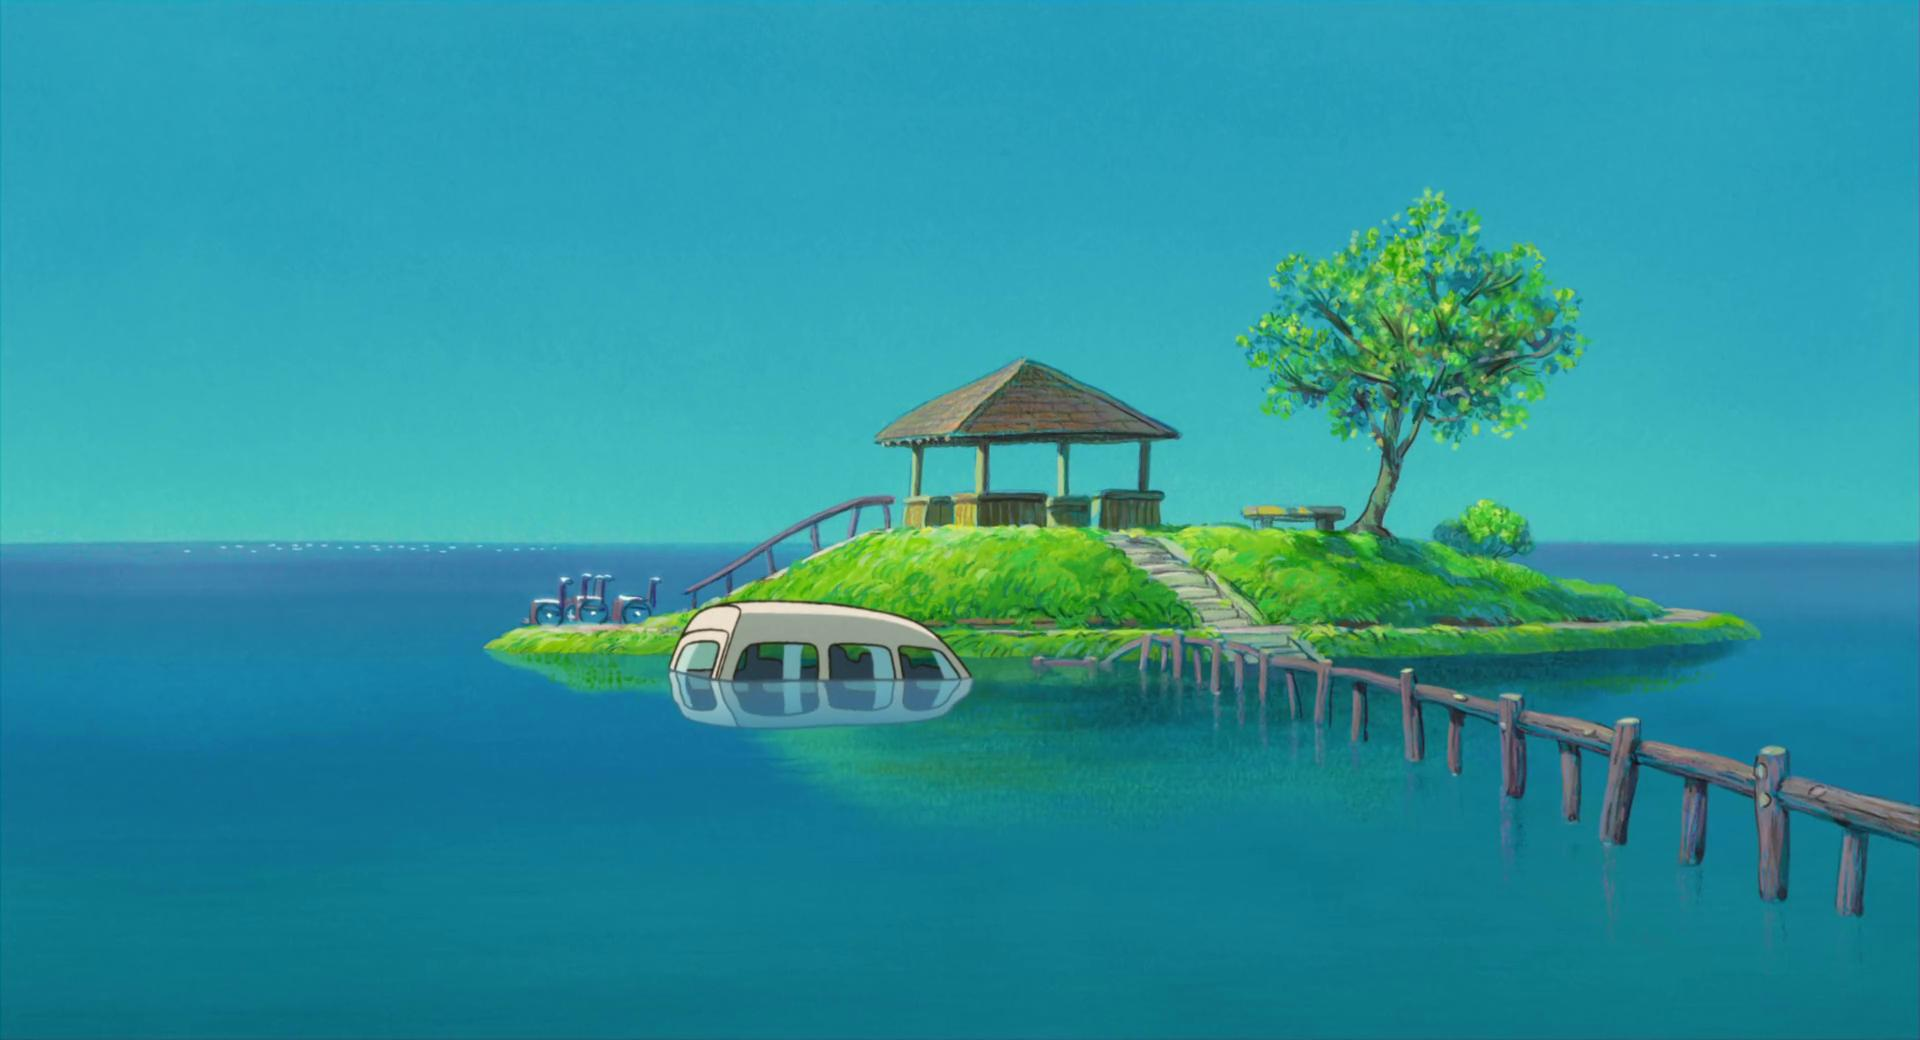 Studio Ghibli Desktop Wallpaper Posted By Ethan Johnson